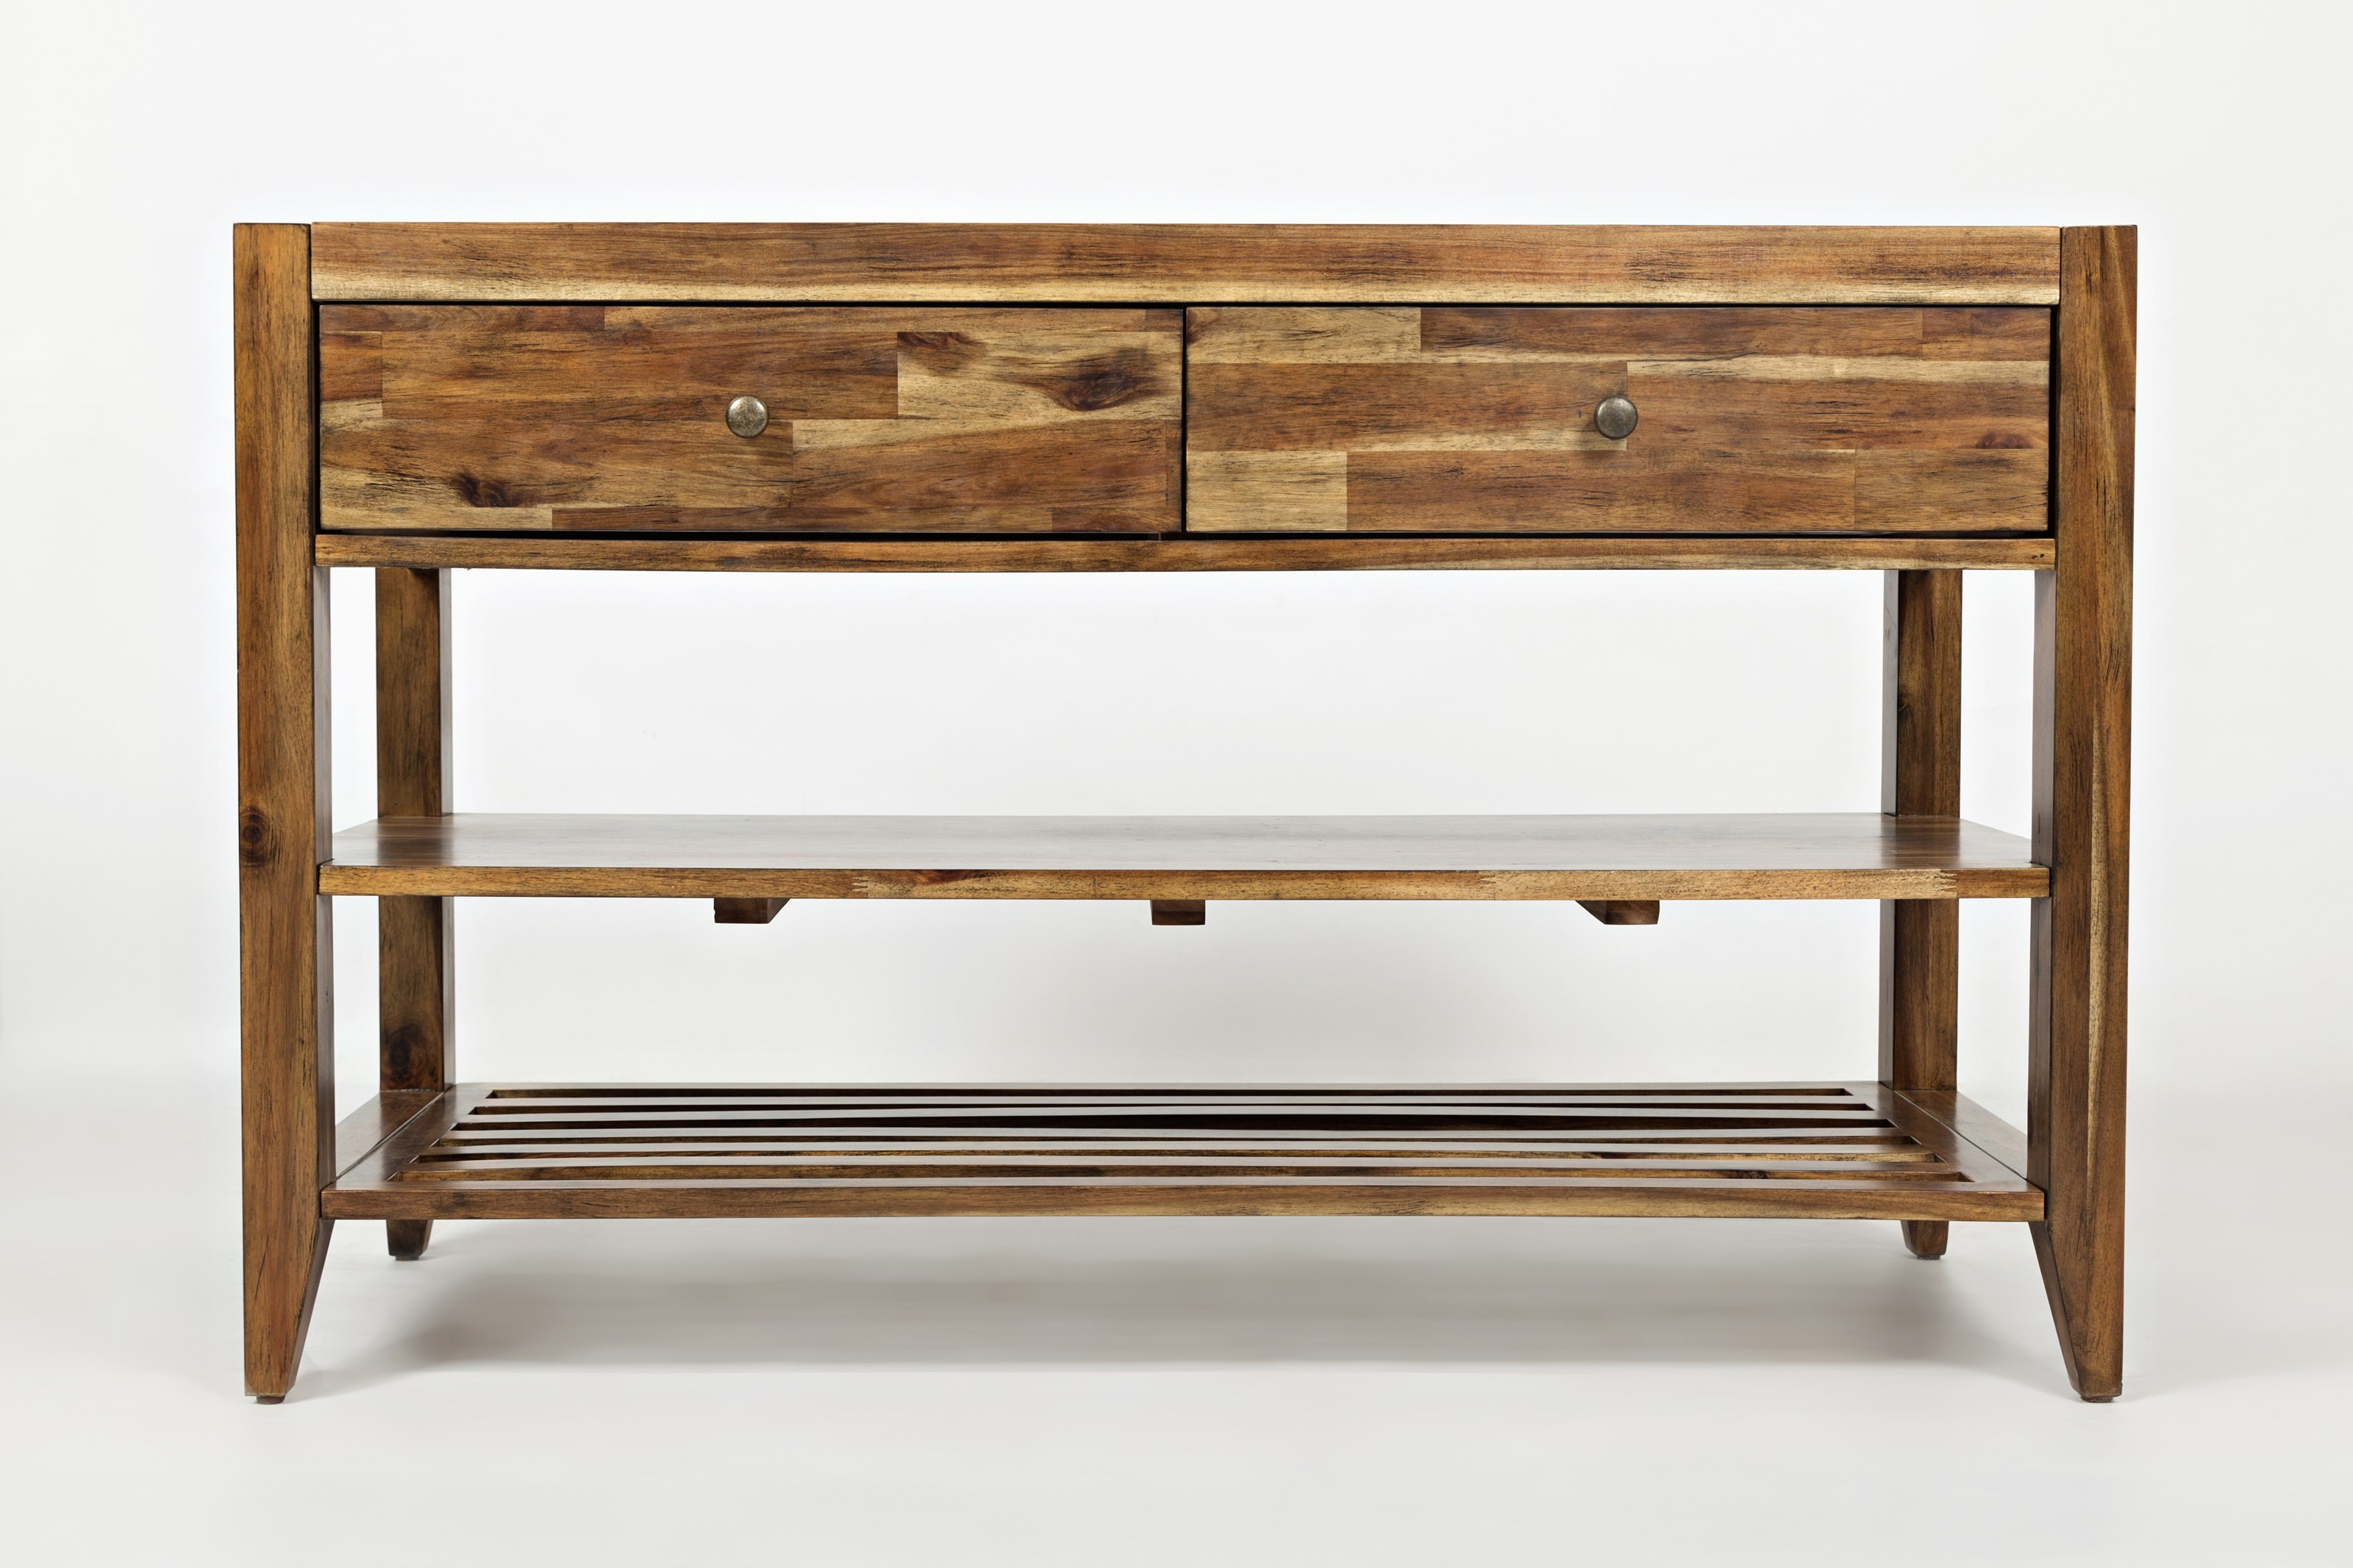 Beacon Street Sofa Table by Jofran at Stoney Creek Furniture